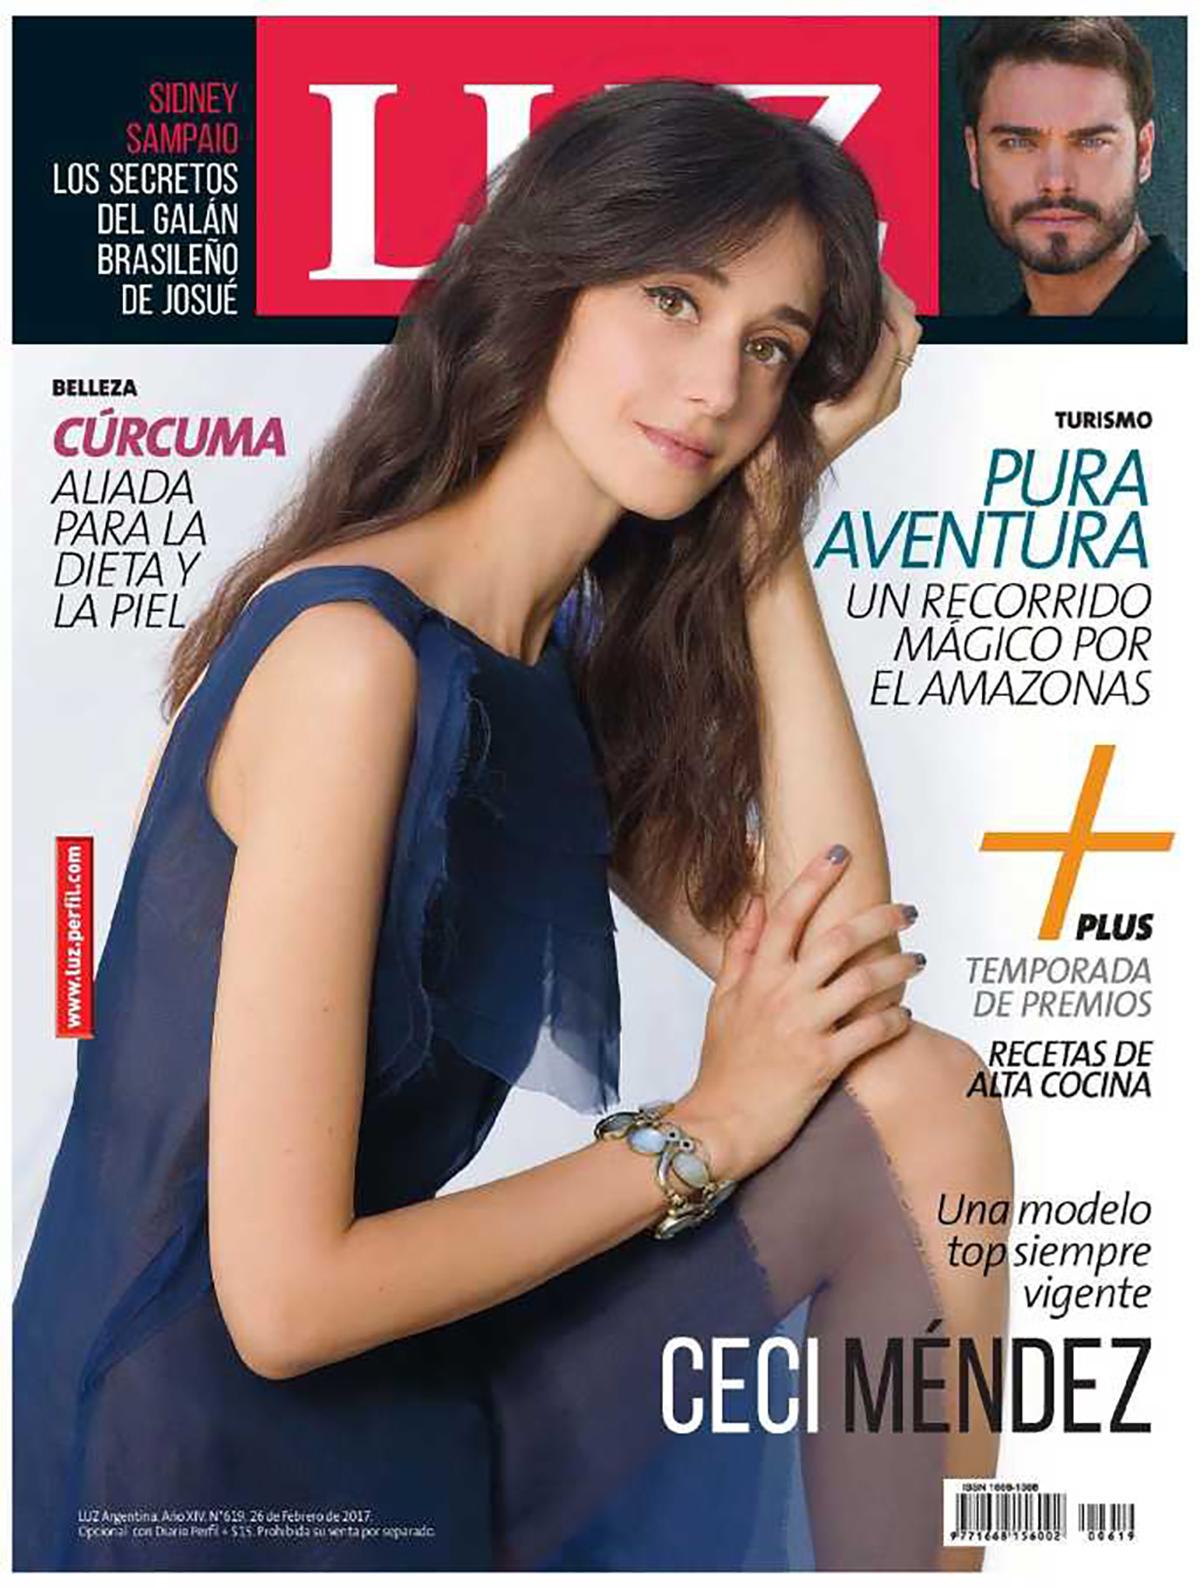 Revista Luz Cover and Interview featuring Ceci Mendez -